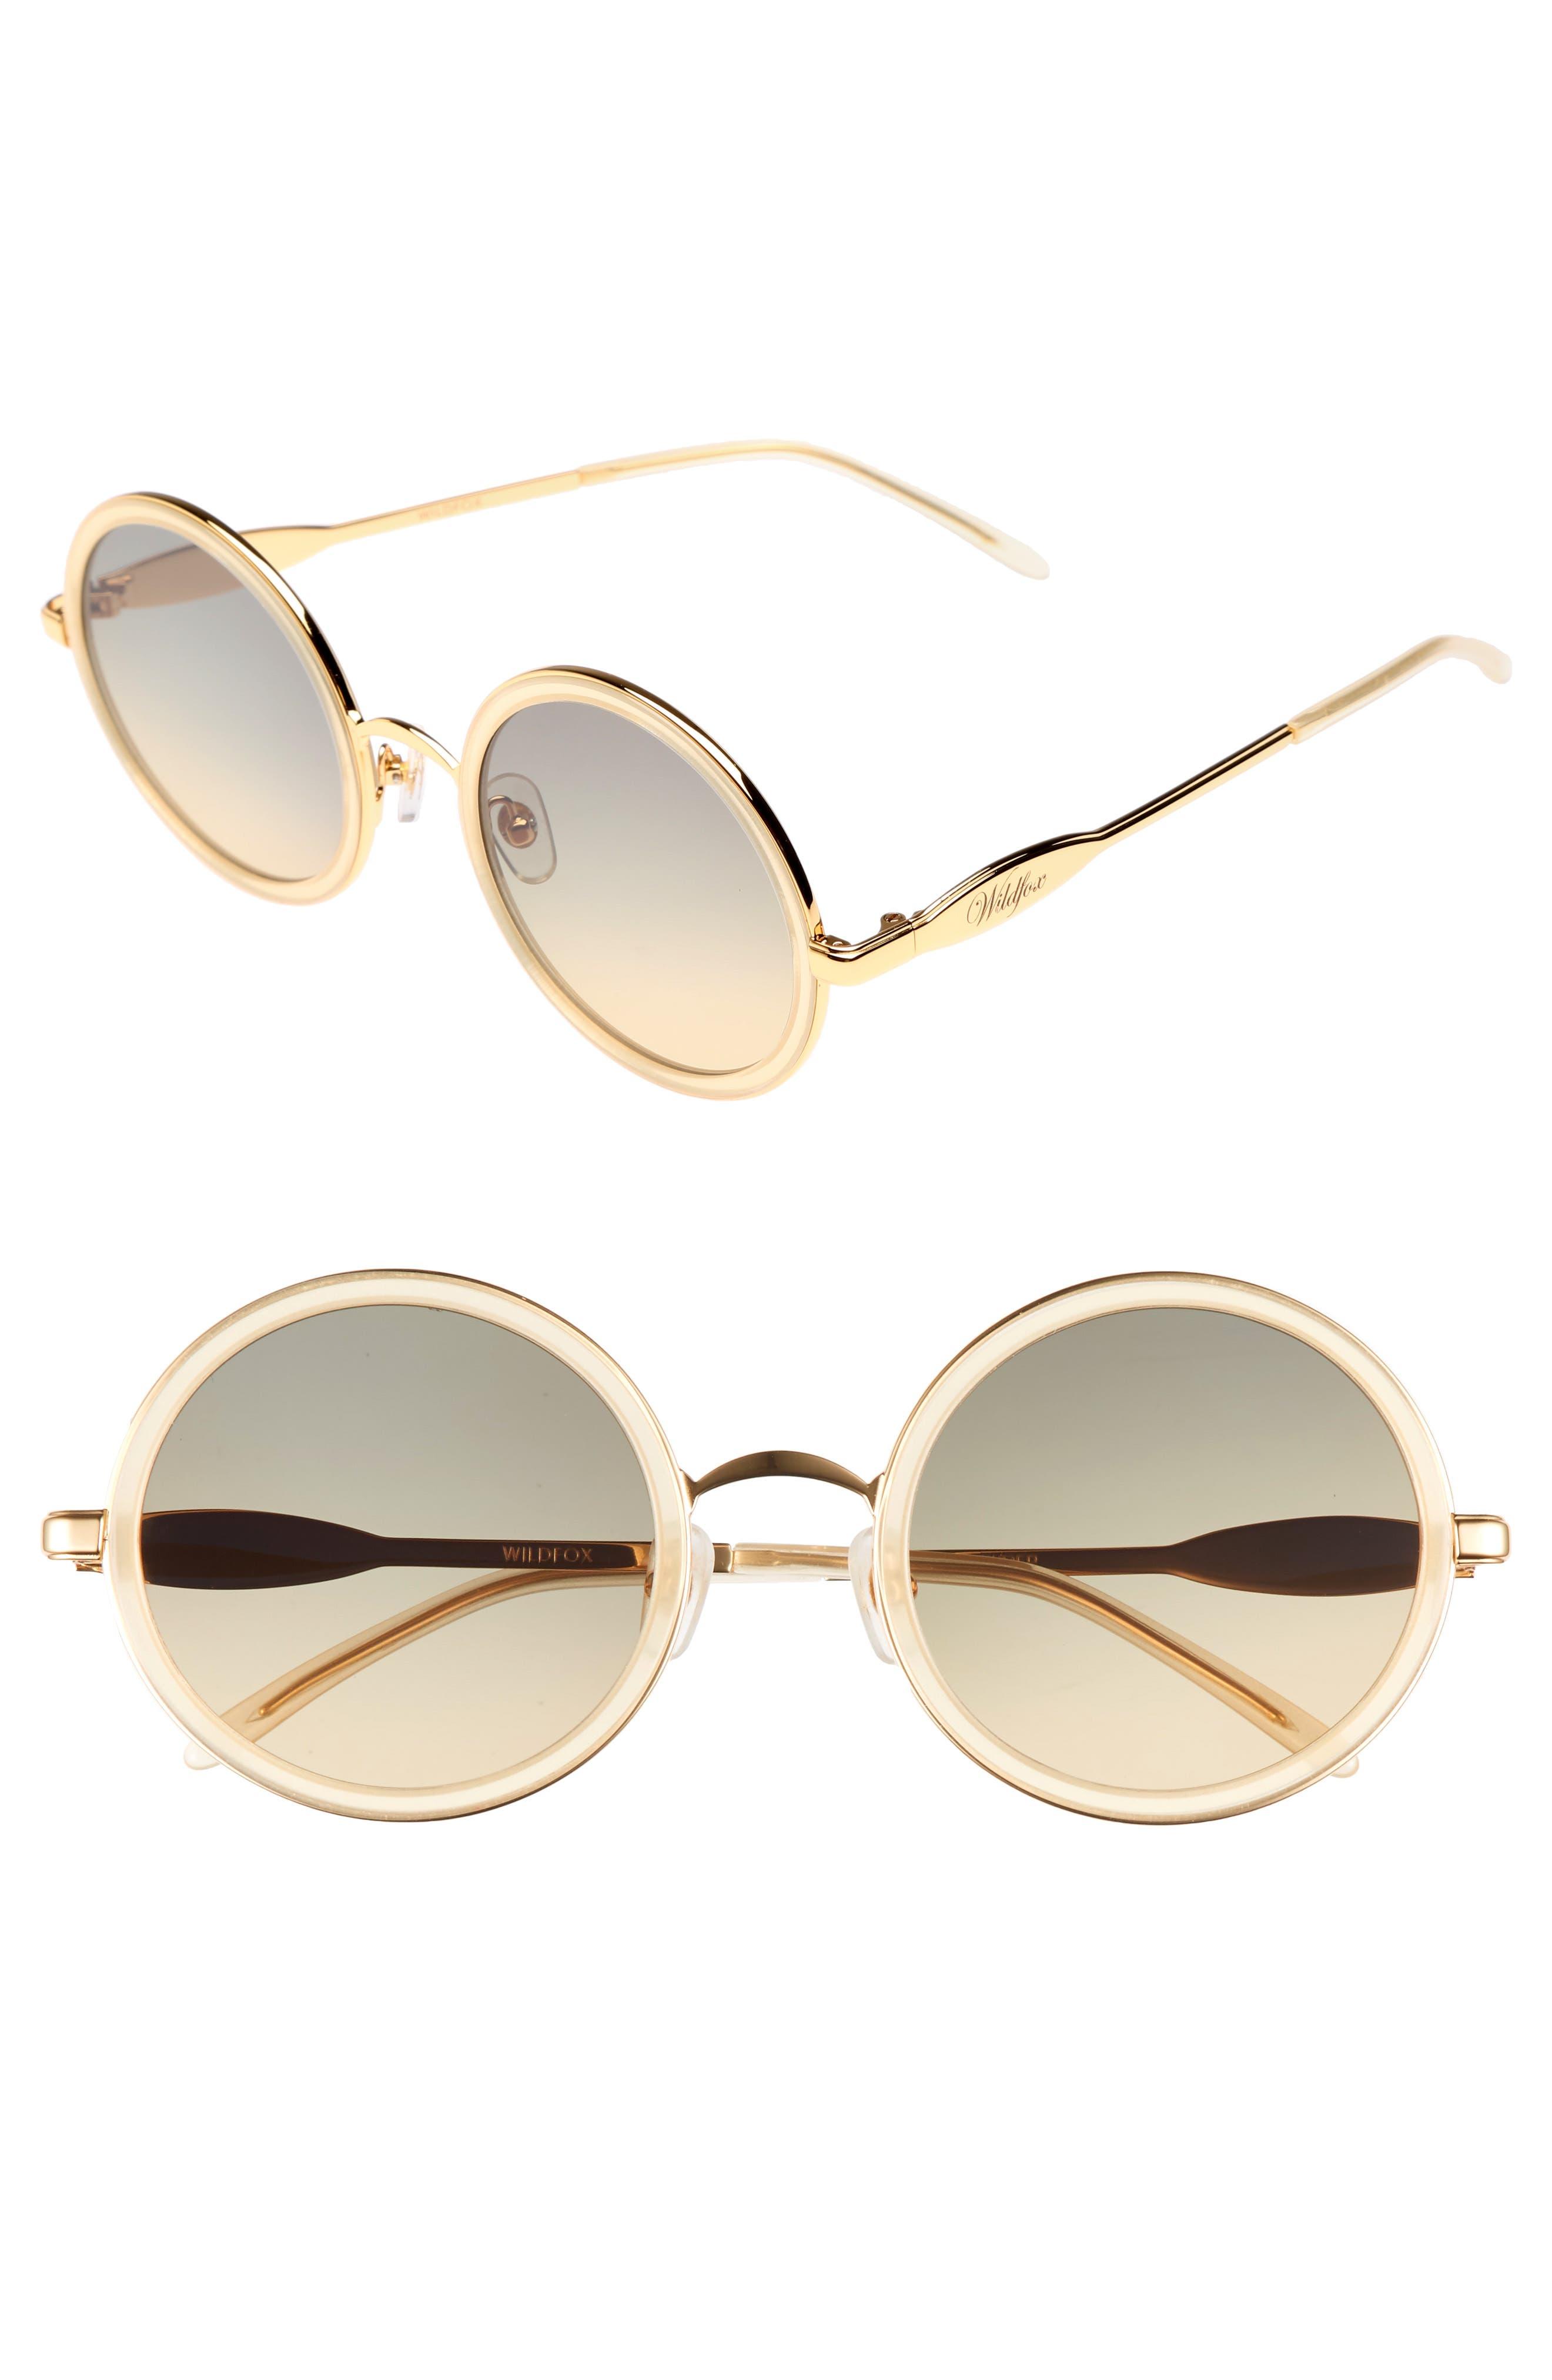 Wildfox Ryder Zero 49mm Flat Round Sunglasses